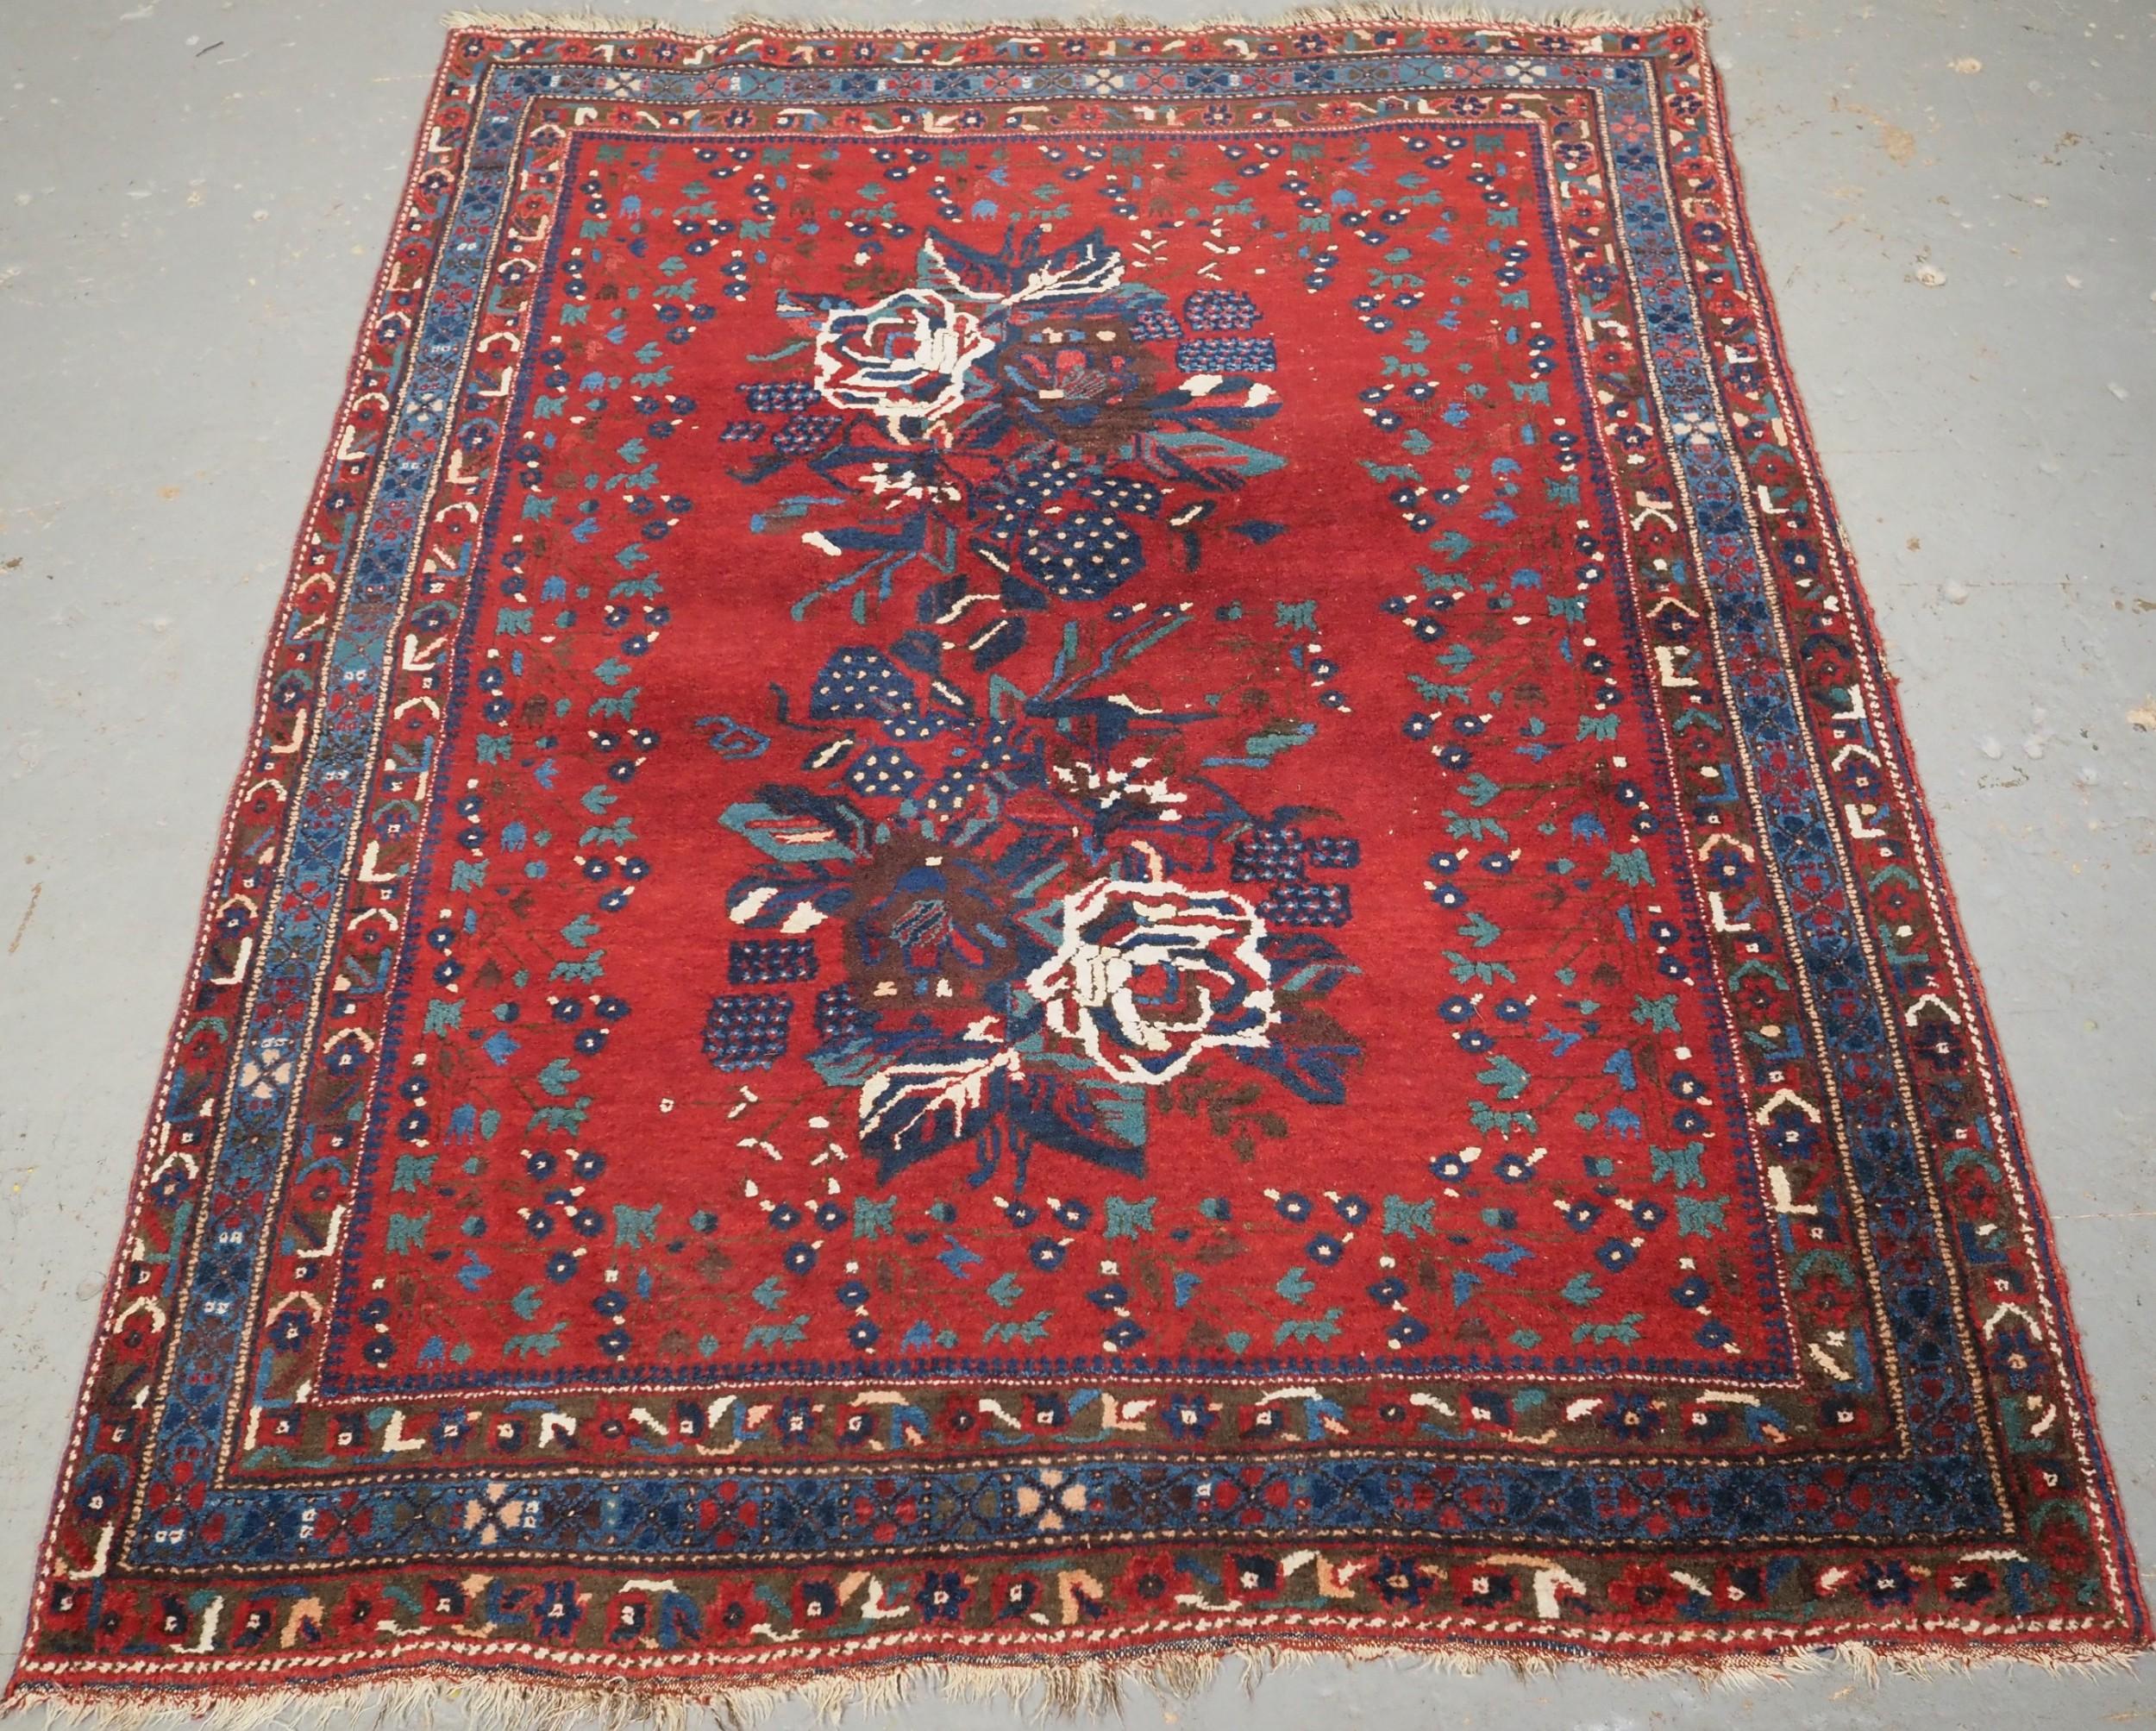 antique afshar rug with floral gul farang design circa 1900